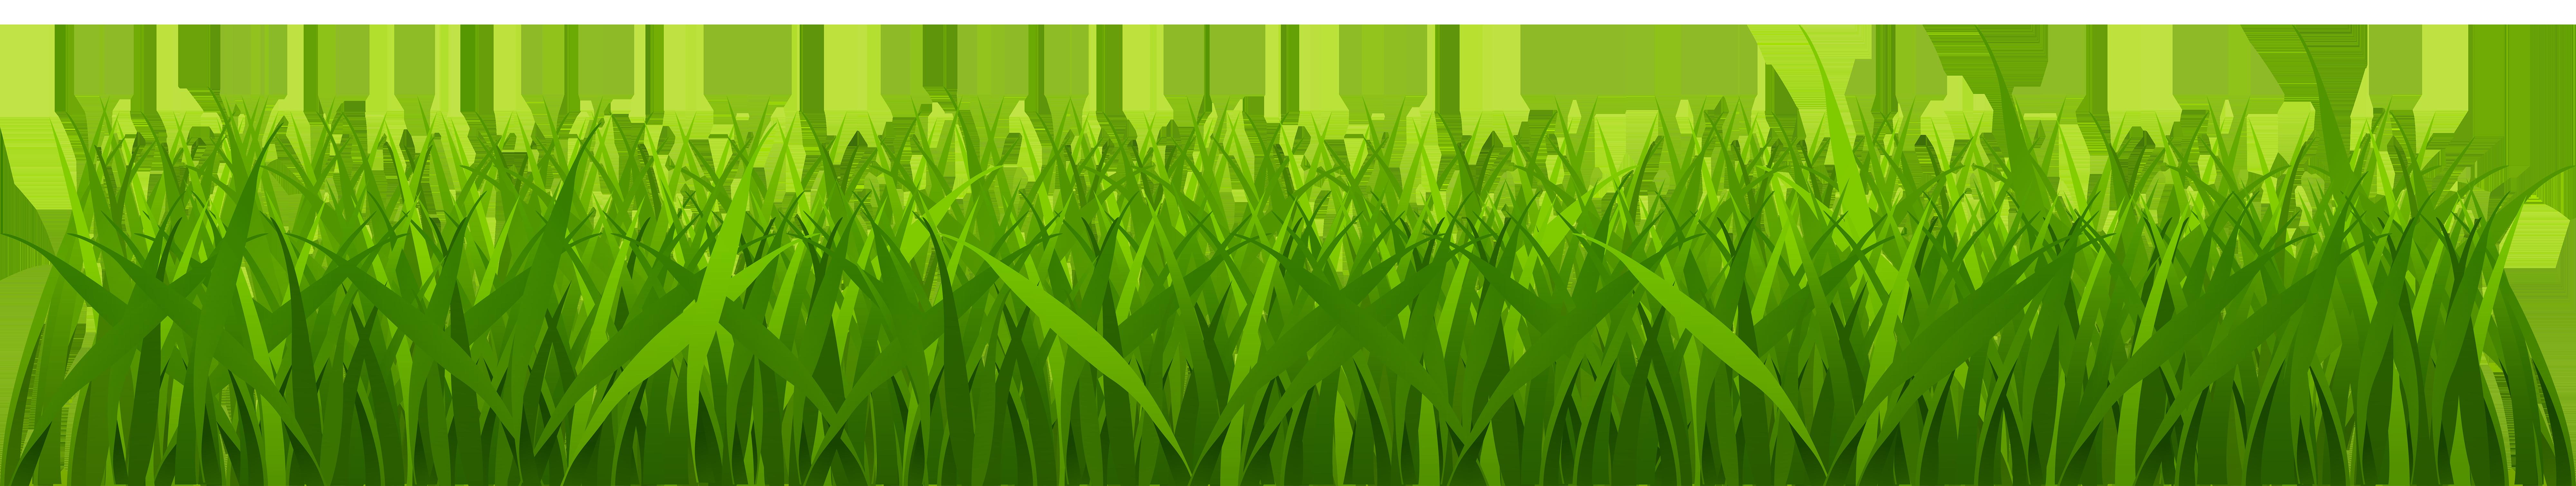 Clipart road path. Grass png clip art